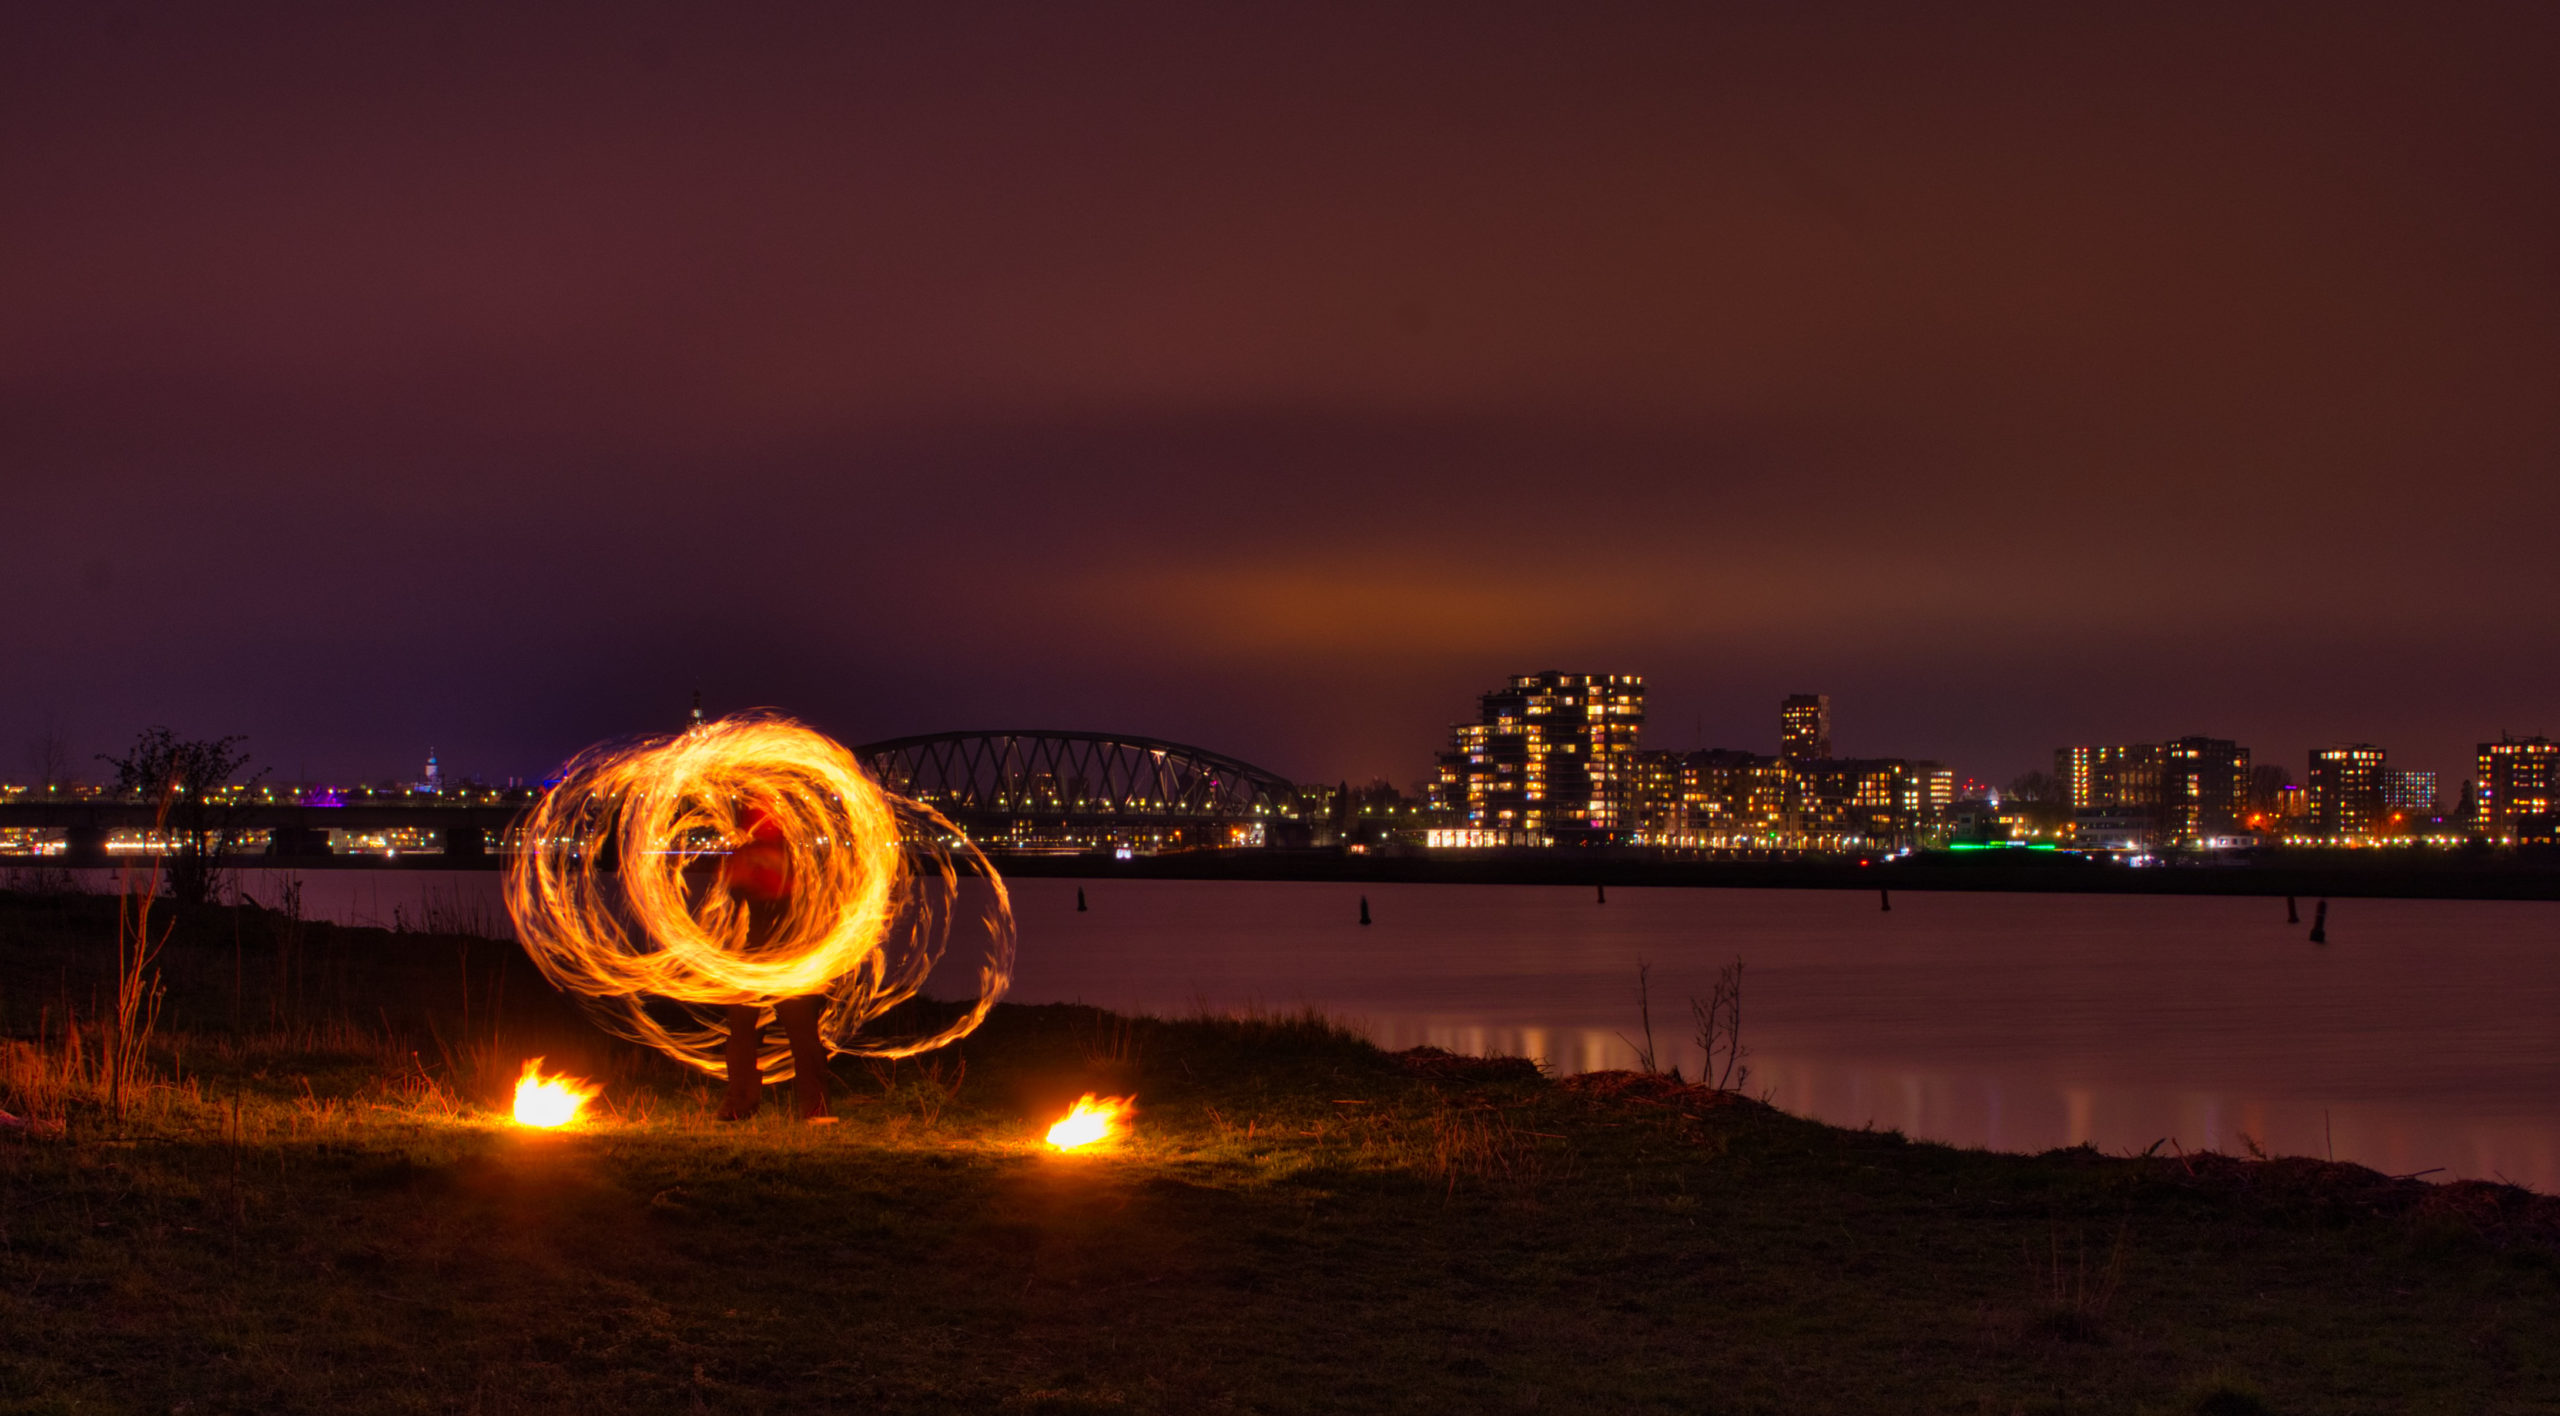 Vuurshow Kiko fire staff spinning - aan de Waal in Nijmegen